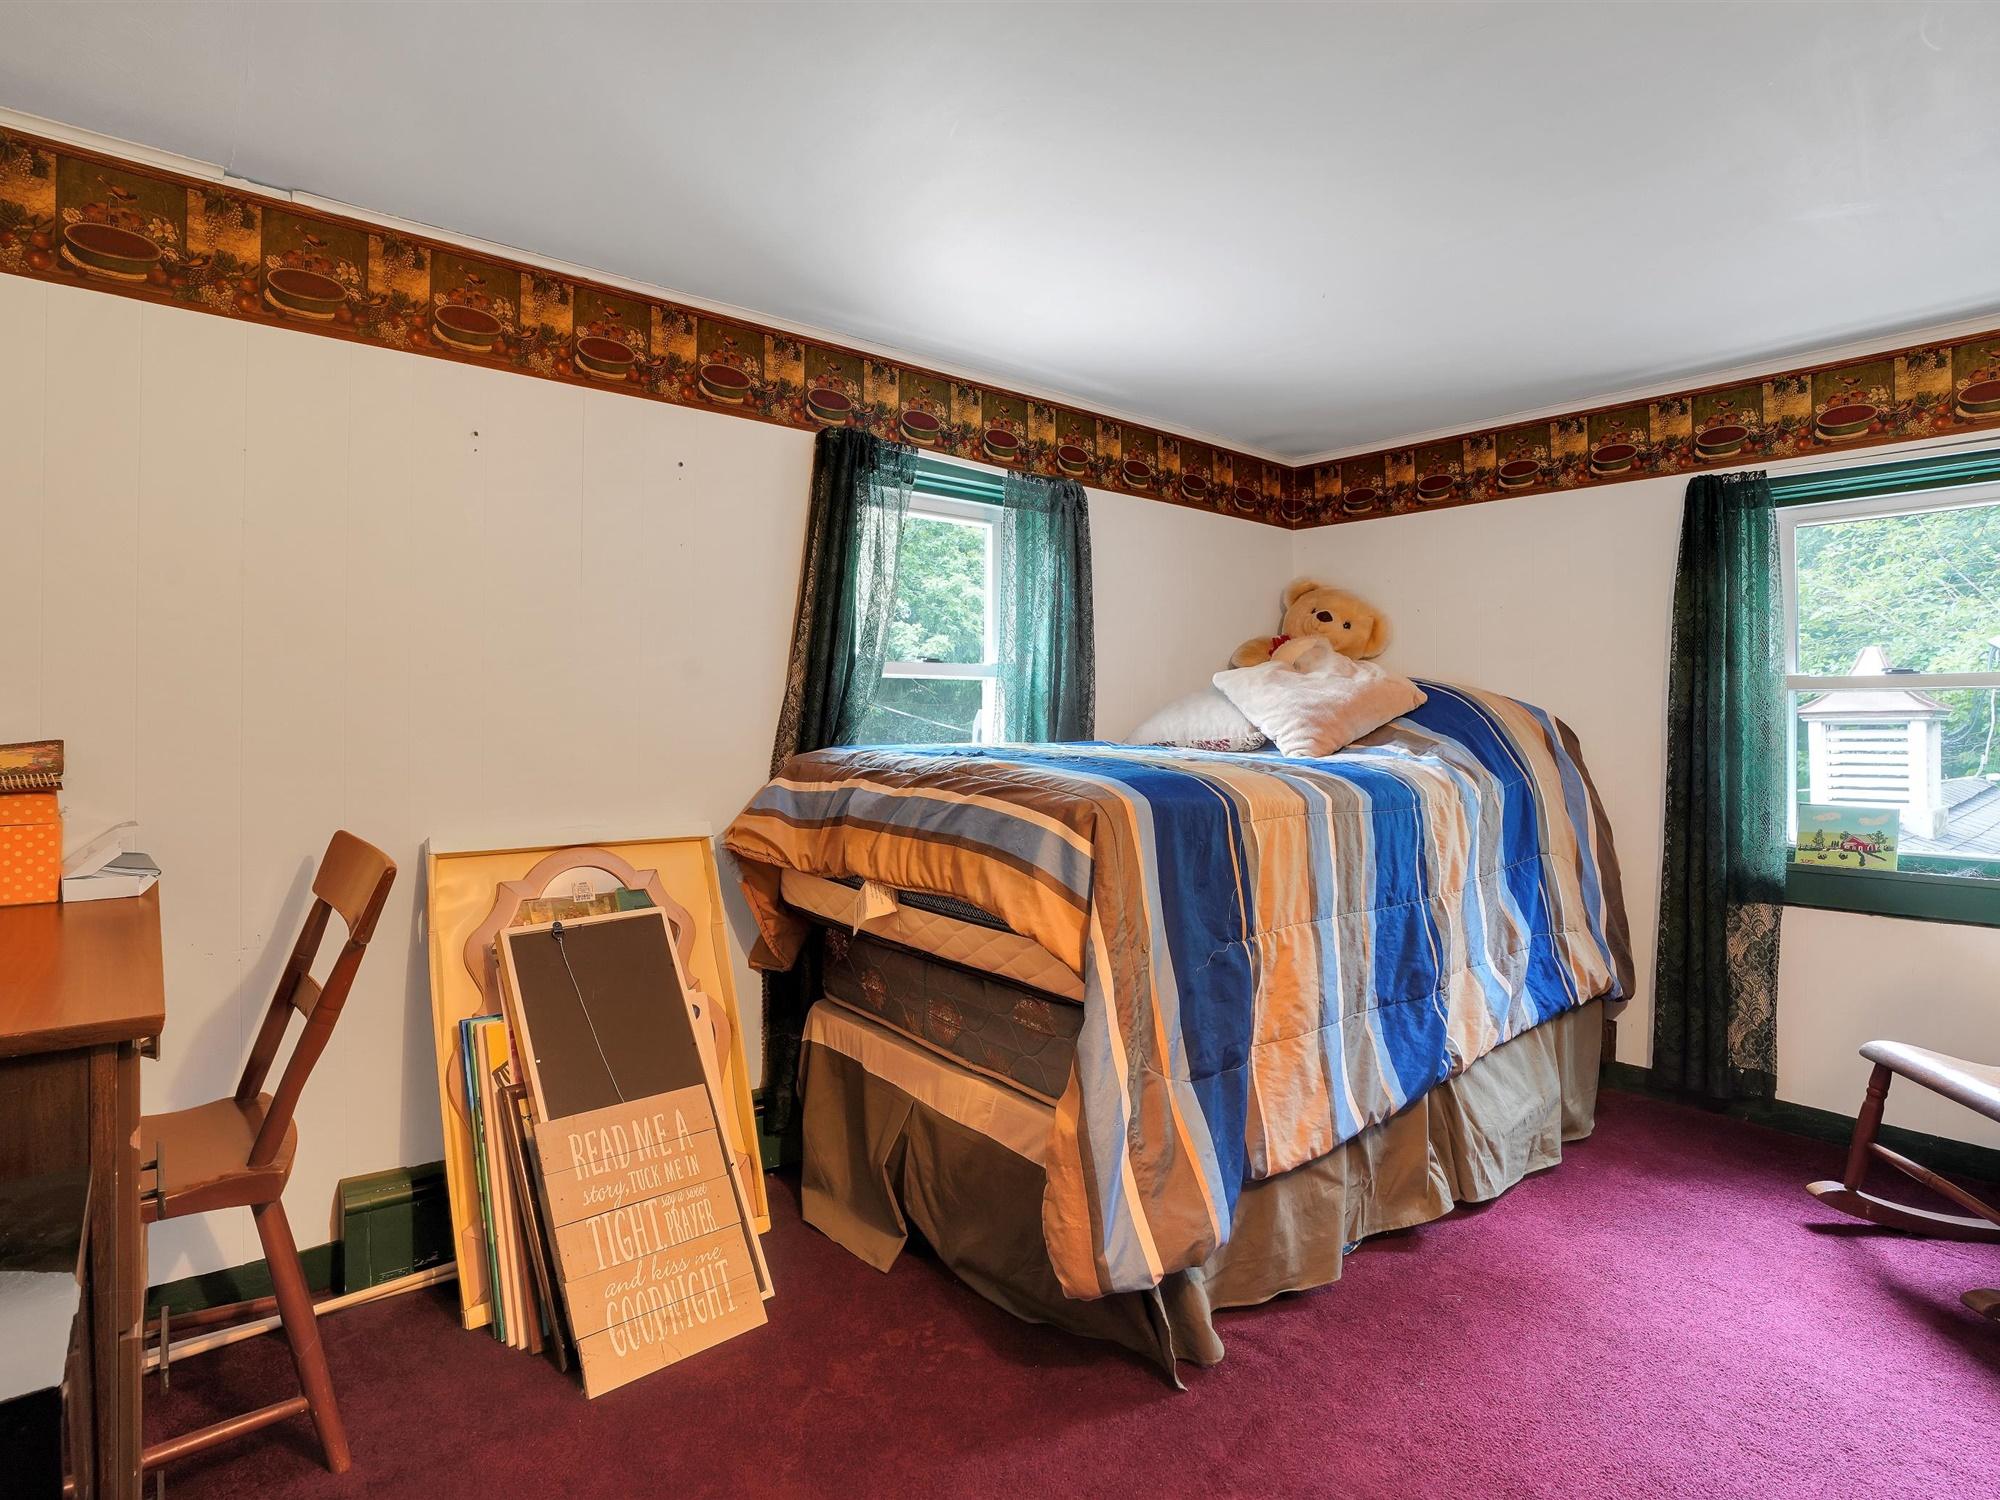 850 Prescott Dr. - Bedroom 1